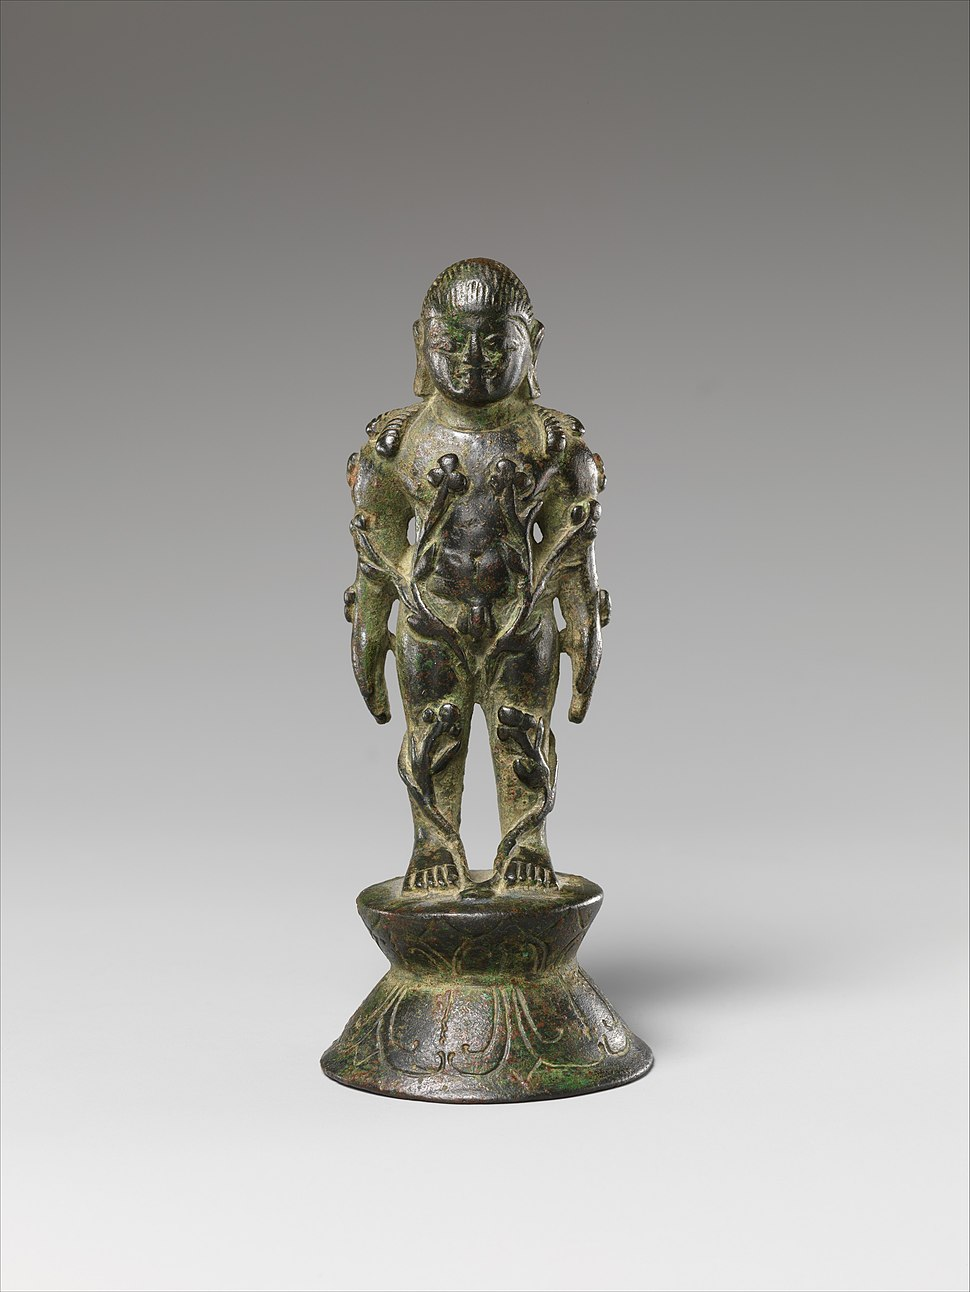 MET DP216814 - Bahubali 6th century